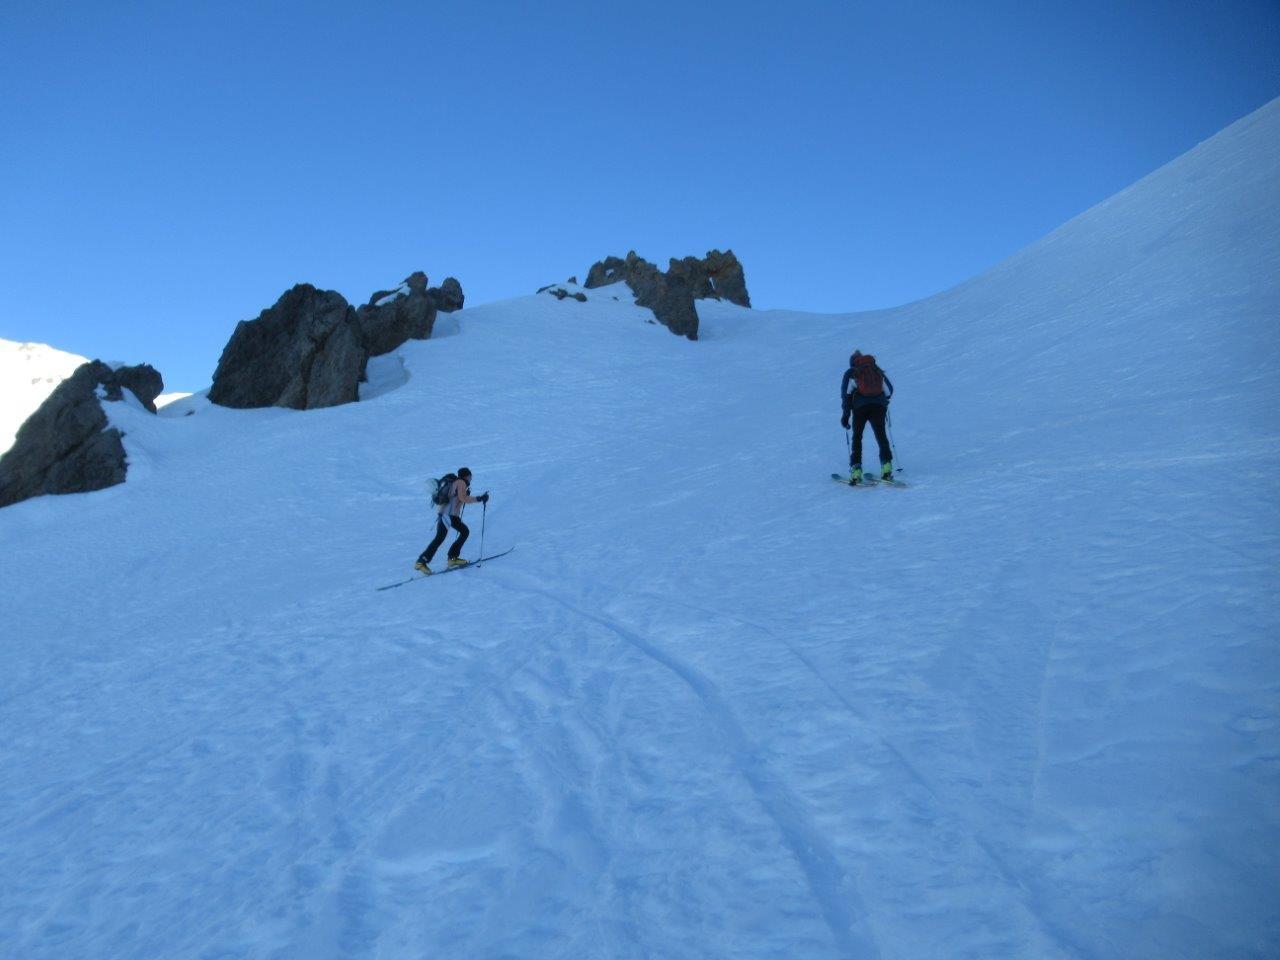 Verso il col des Trois Freres Mineurs. La neve è già dura.